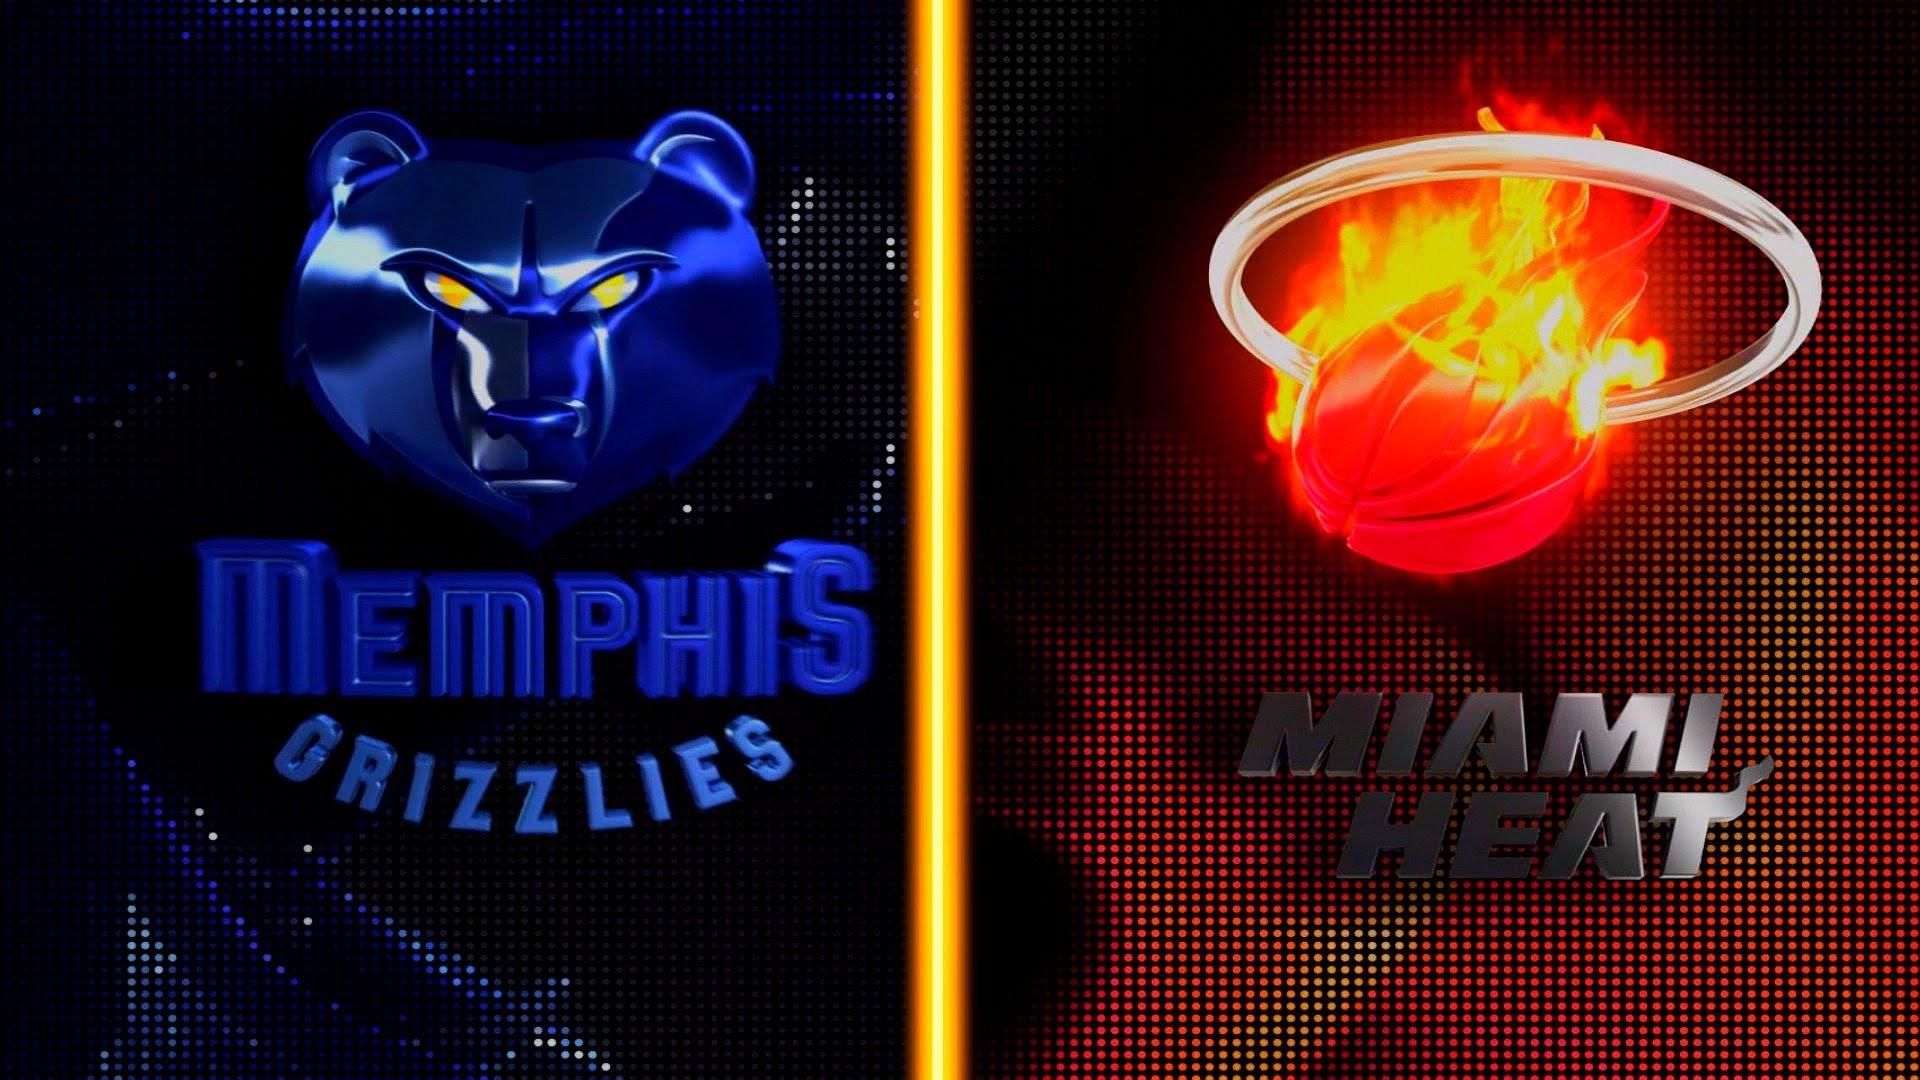 Memphis Grizzlies Wallpapers 74 Images